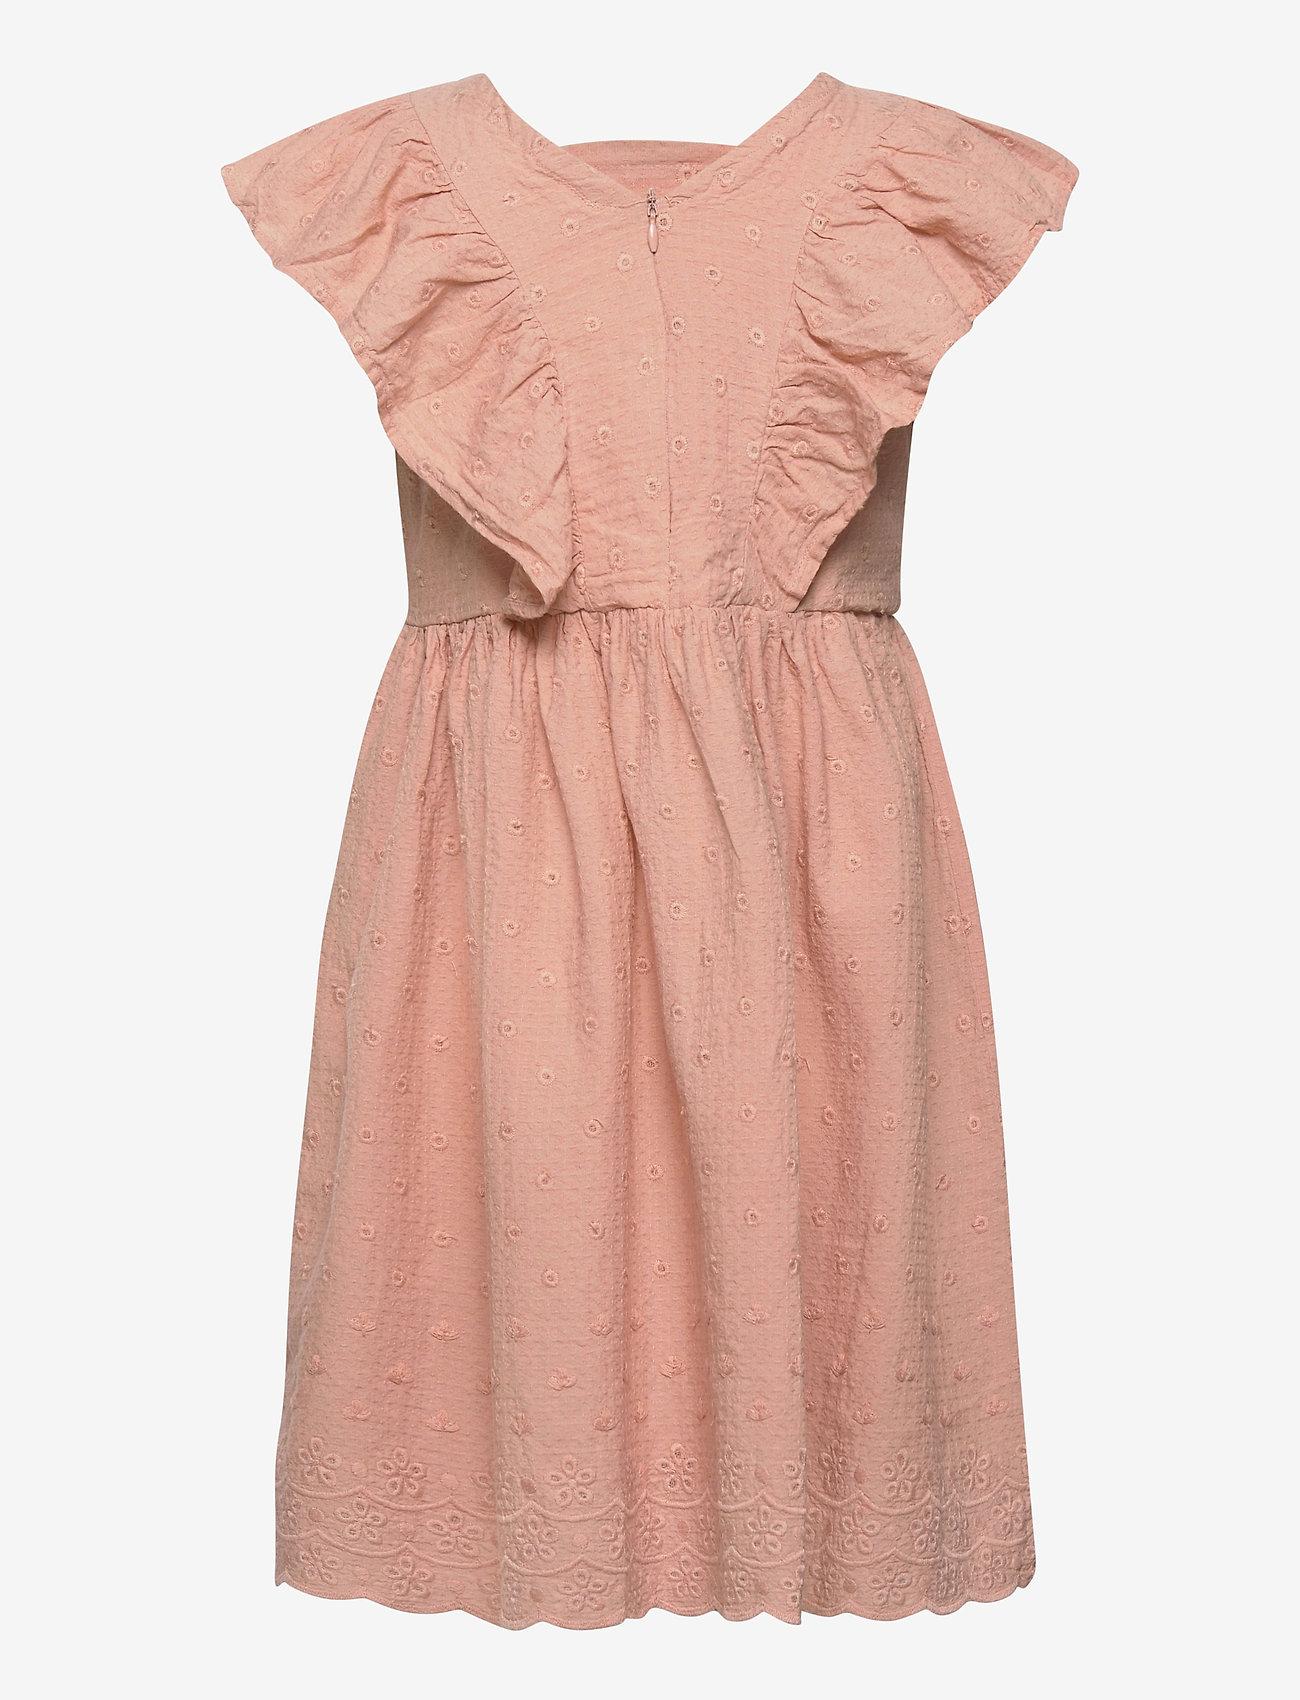 Hust & Claire - Katia - Dress - kleider - desert red - 1